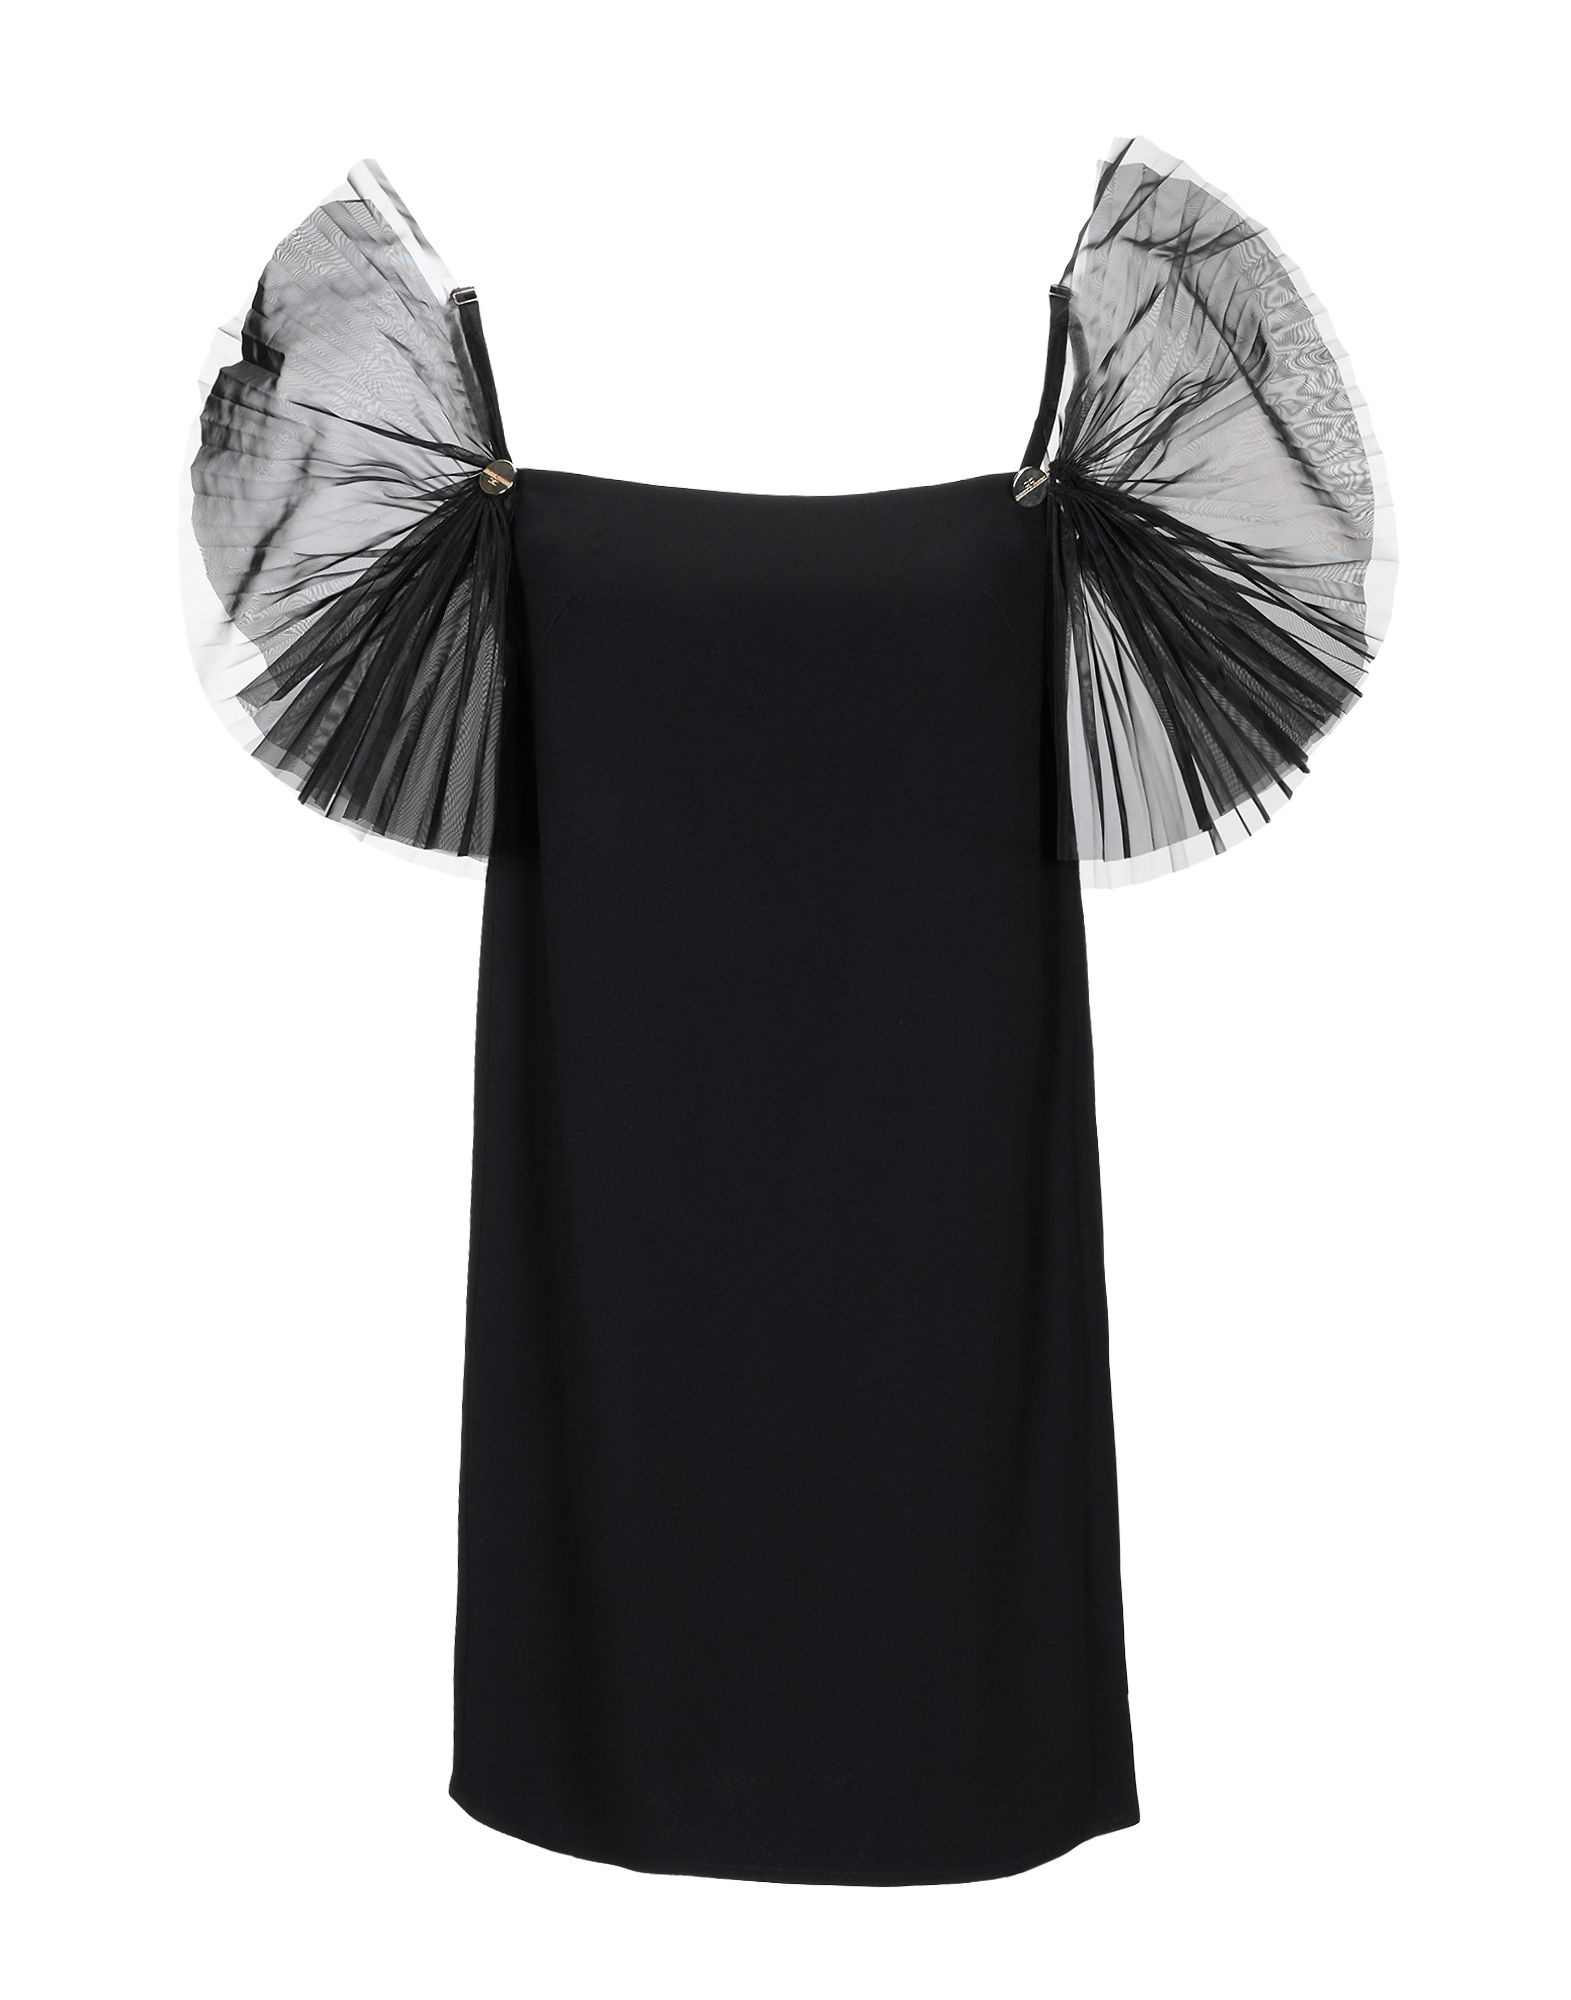 PASSEPARTOUT DRESS by ELISABETTA FRANCHI CELYN b. Короткое платье платье прямое b young samar dress